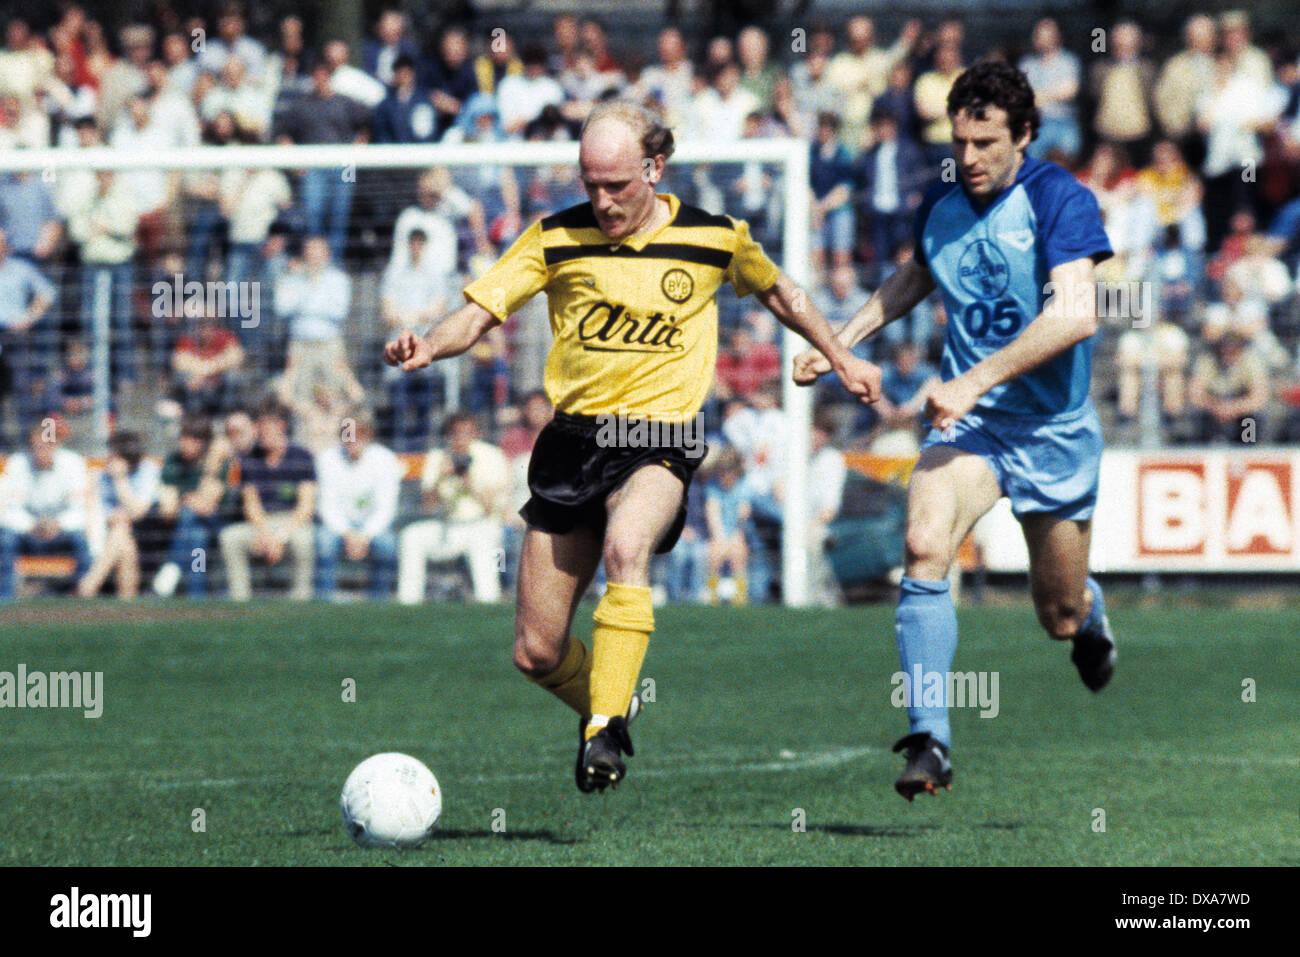 football, Bundesliga, 1983/1984, Grotenburg Stadium, FC Bayer 05 Uerdingen versus Borussia Dortmund 2:1, scene of the match, Ulrich Bittcher (BVB) in ball possession, right Peter Schwarz (Bayer) - Stock Image